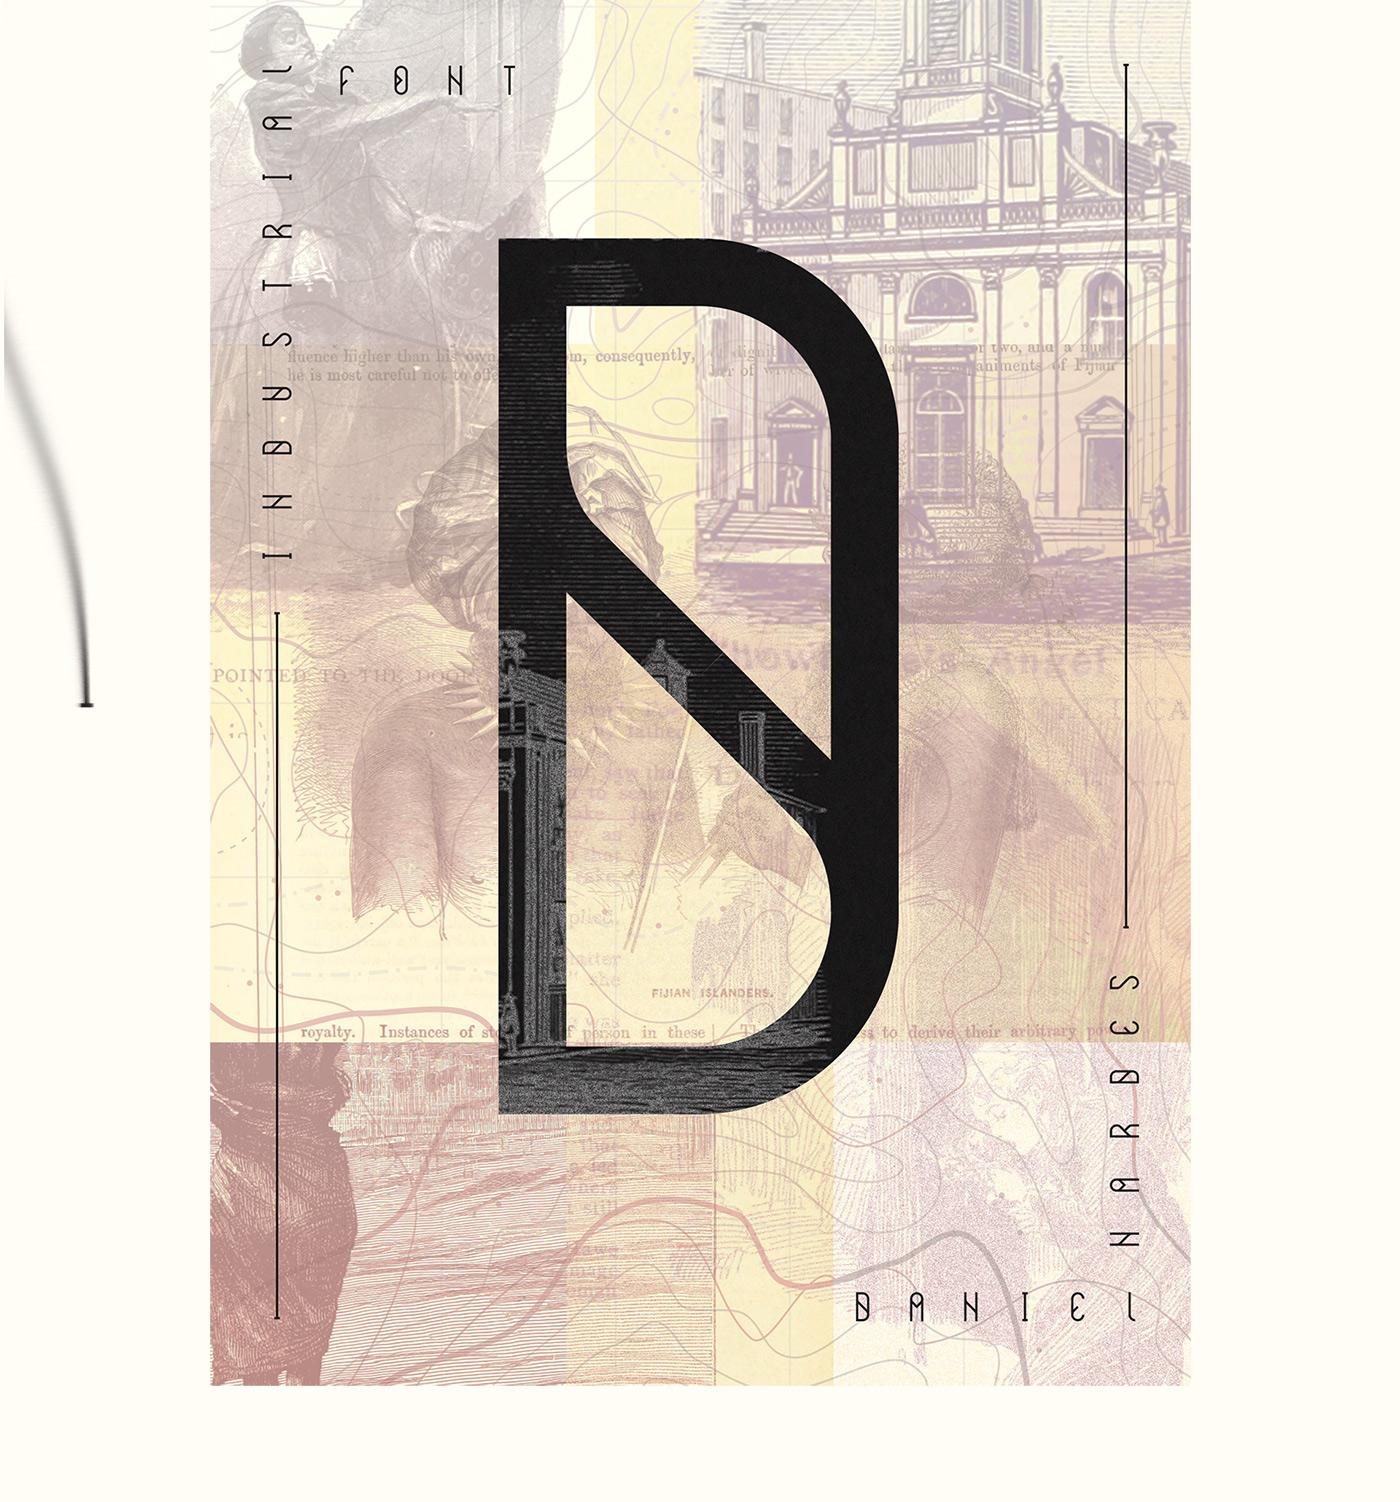 Industrial-font-Daniel_Nardes (4)